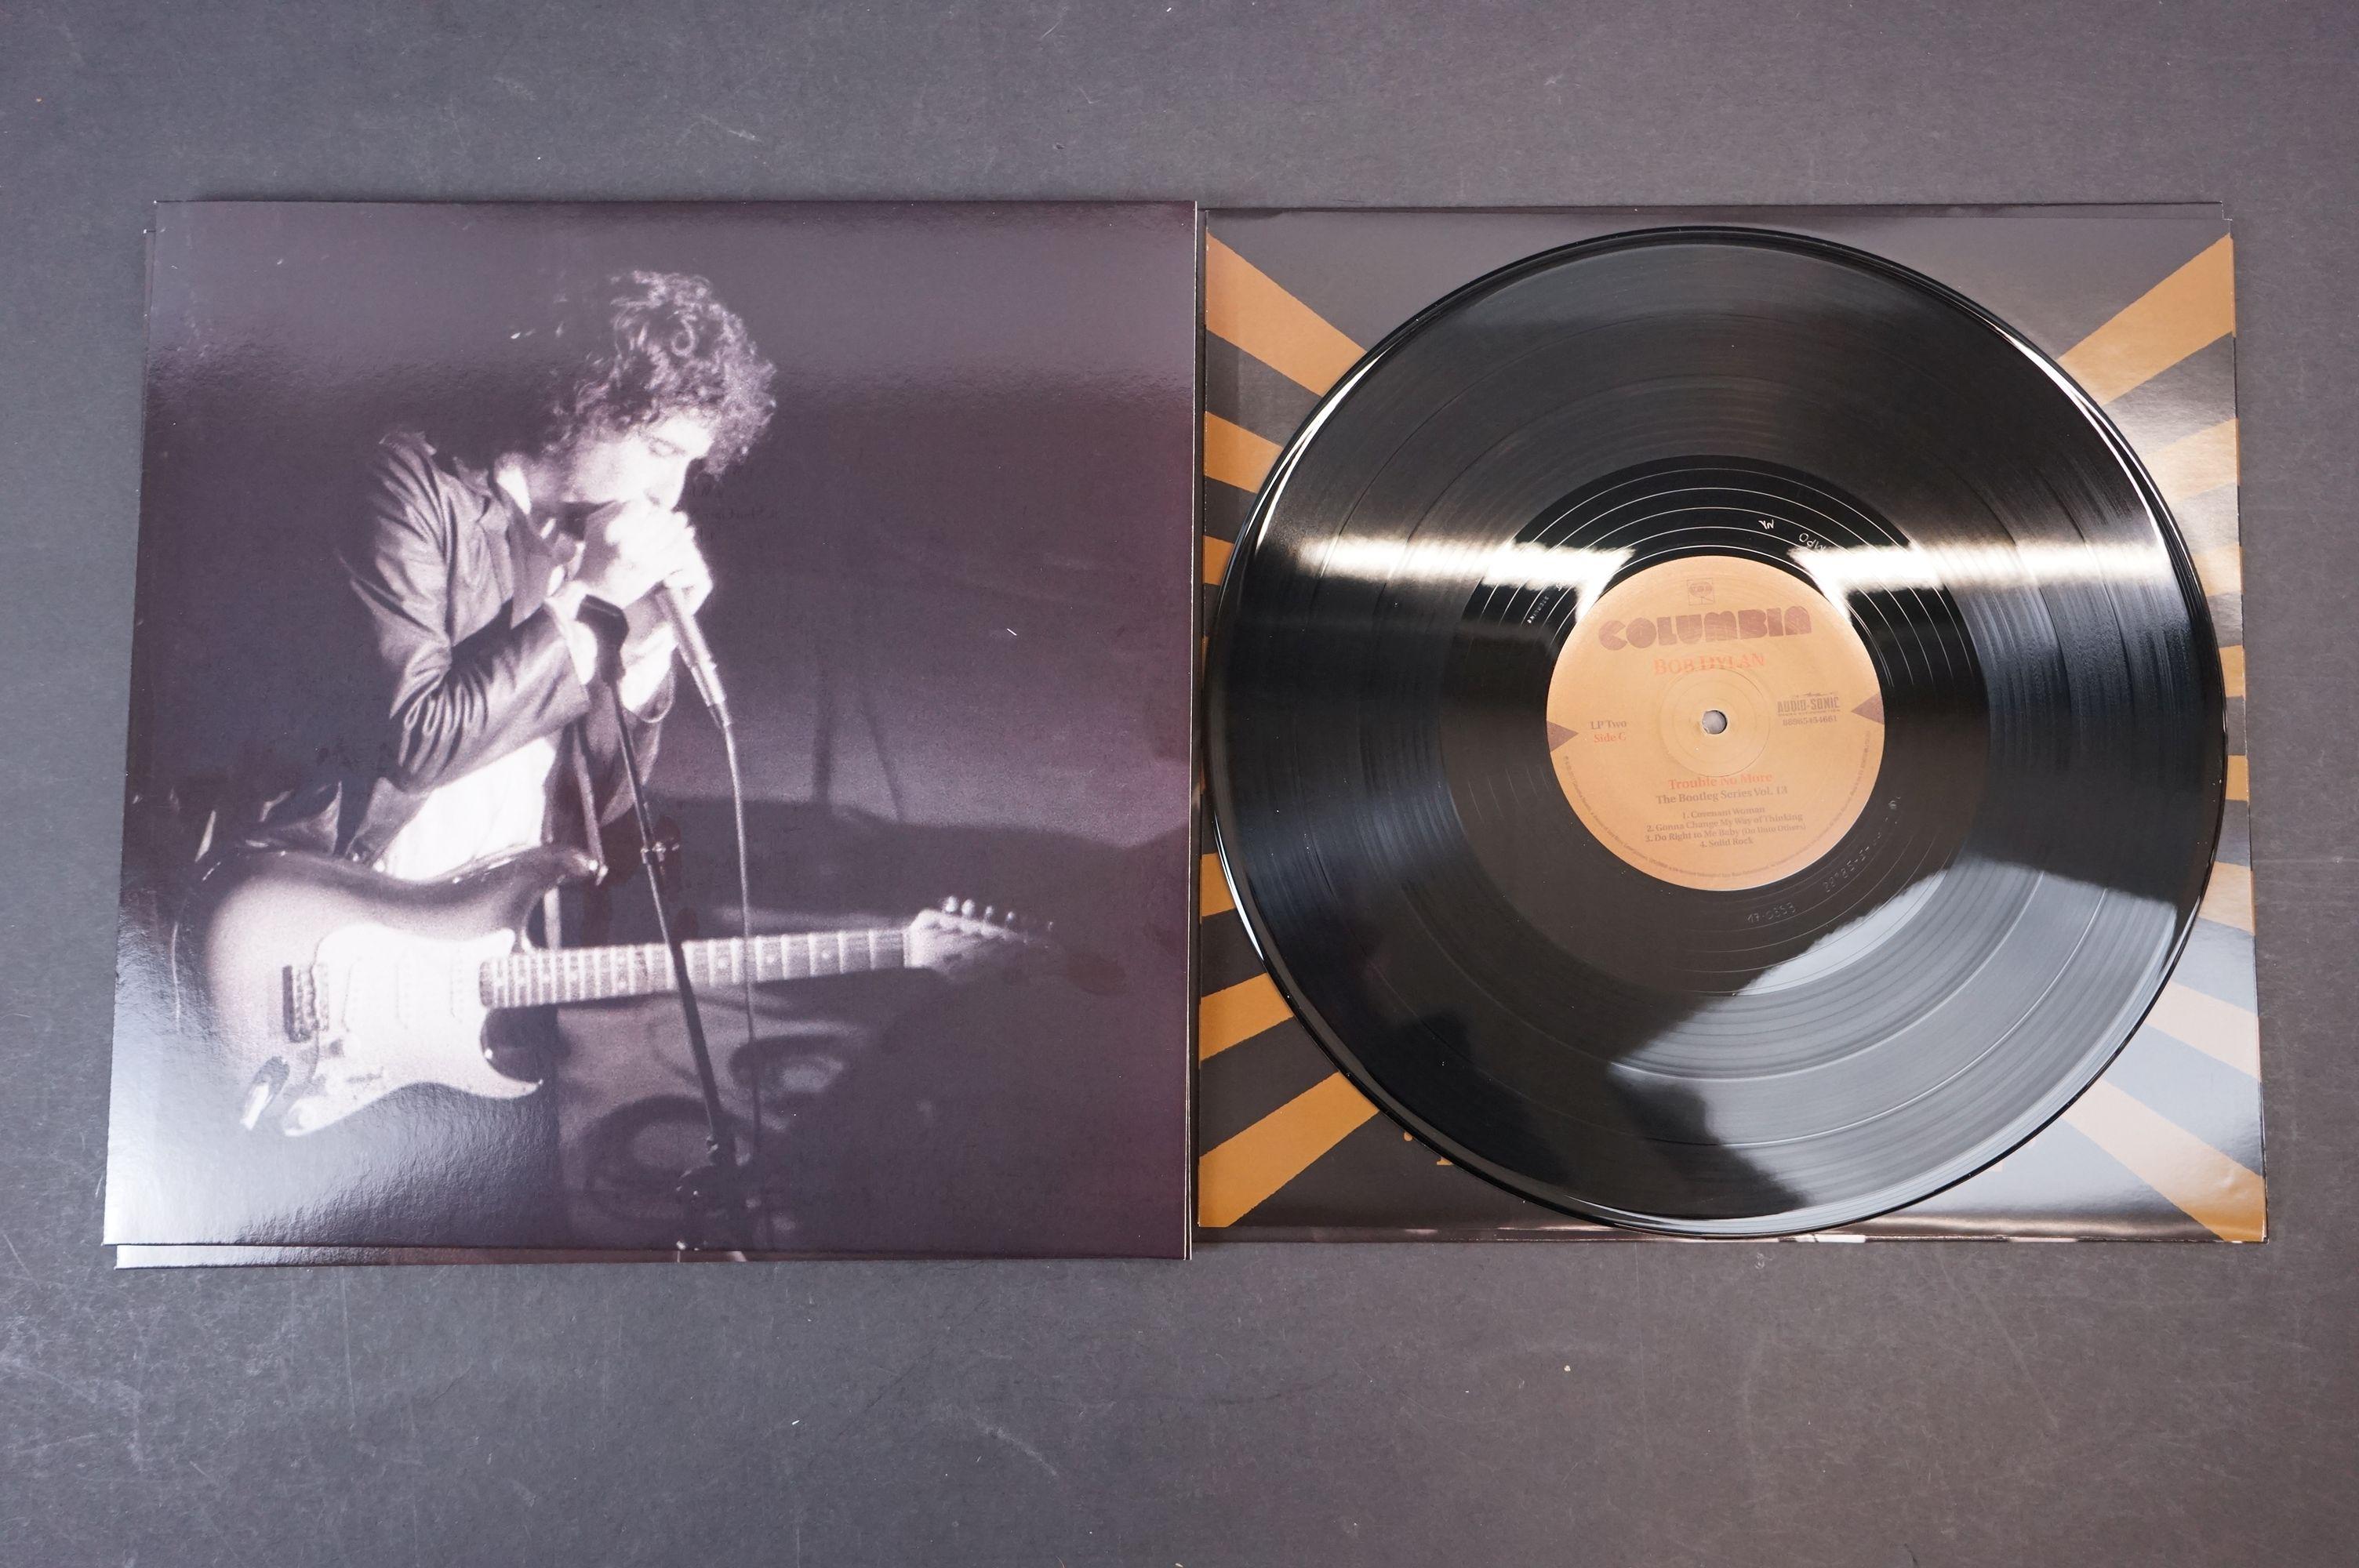 Vinyl - Bob Dylan Trouble No More The Bootleg Series vol 13 1979-1981 4 LP Box Set, ex - Image 6 of 9